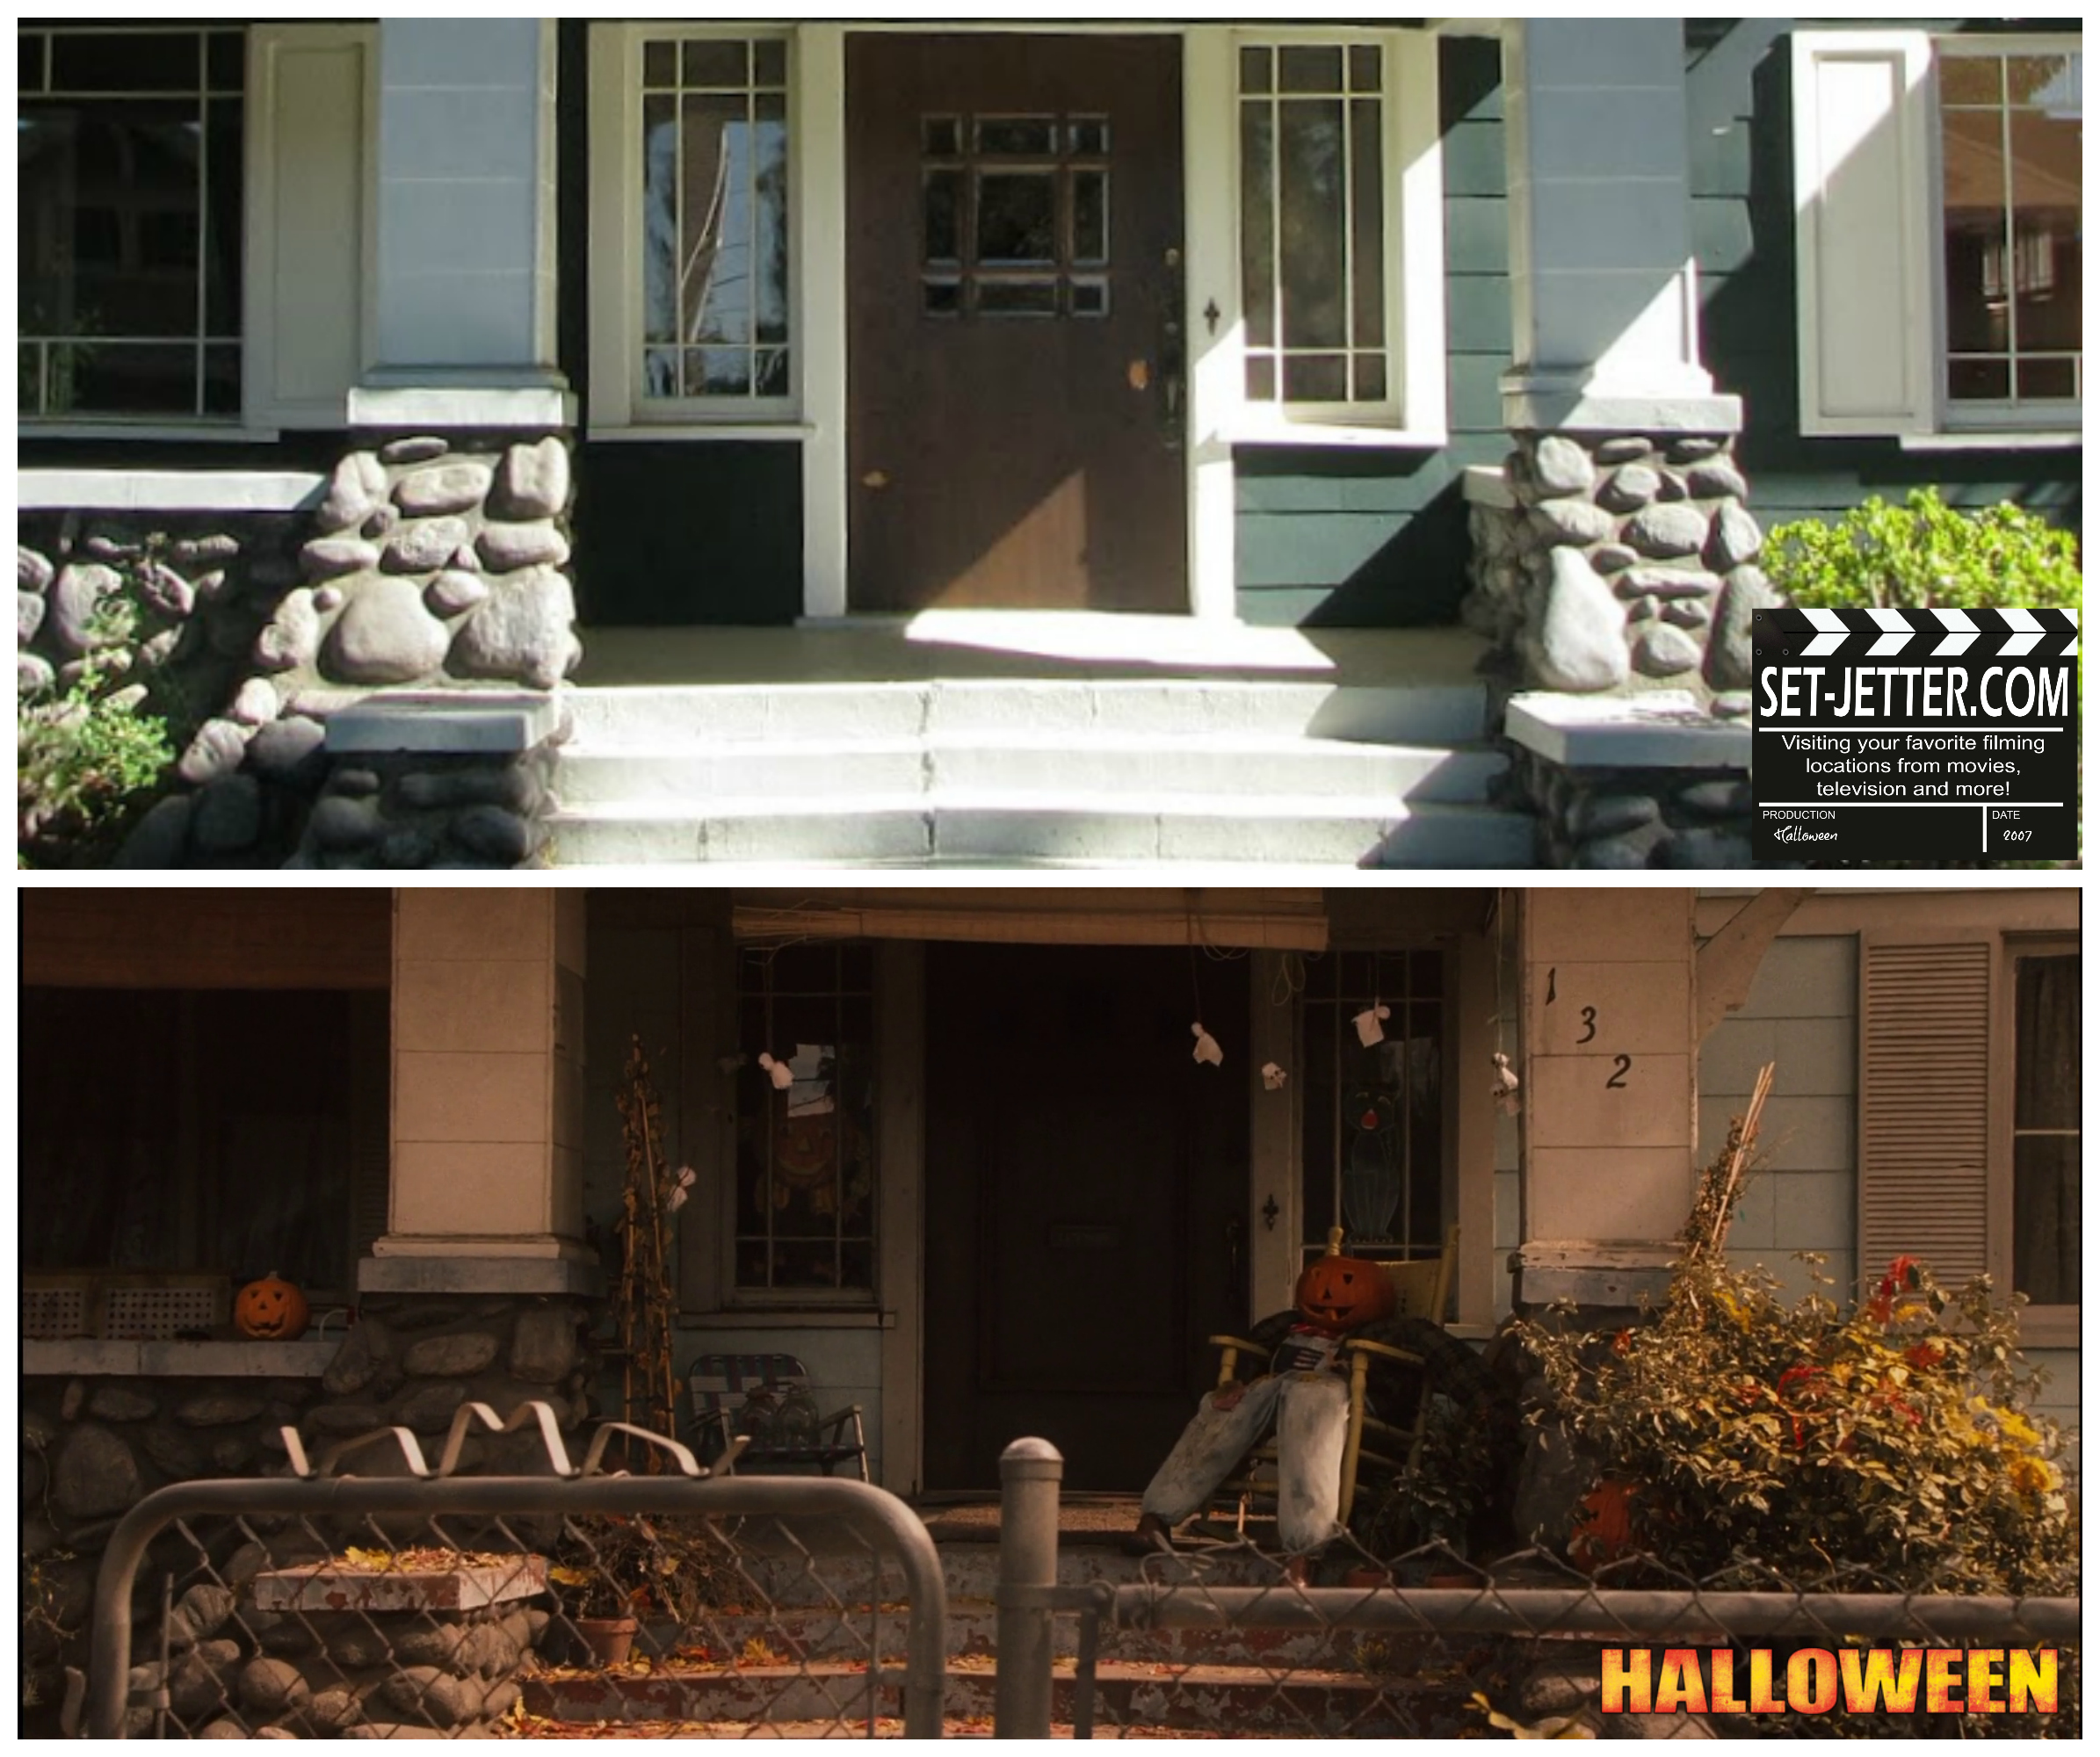 Halloween 2007 comparison 03.jpg